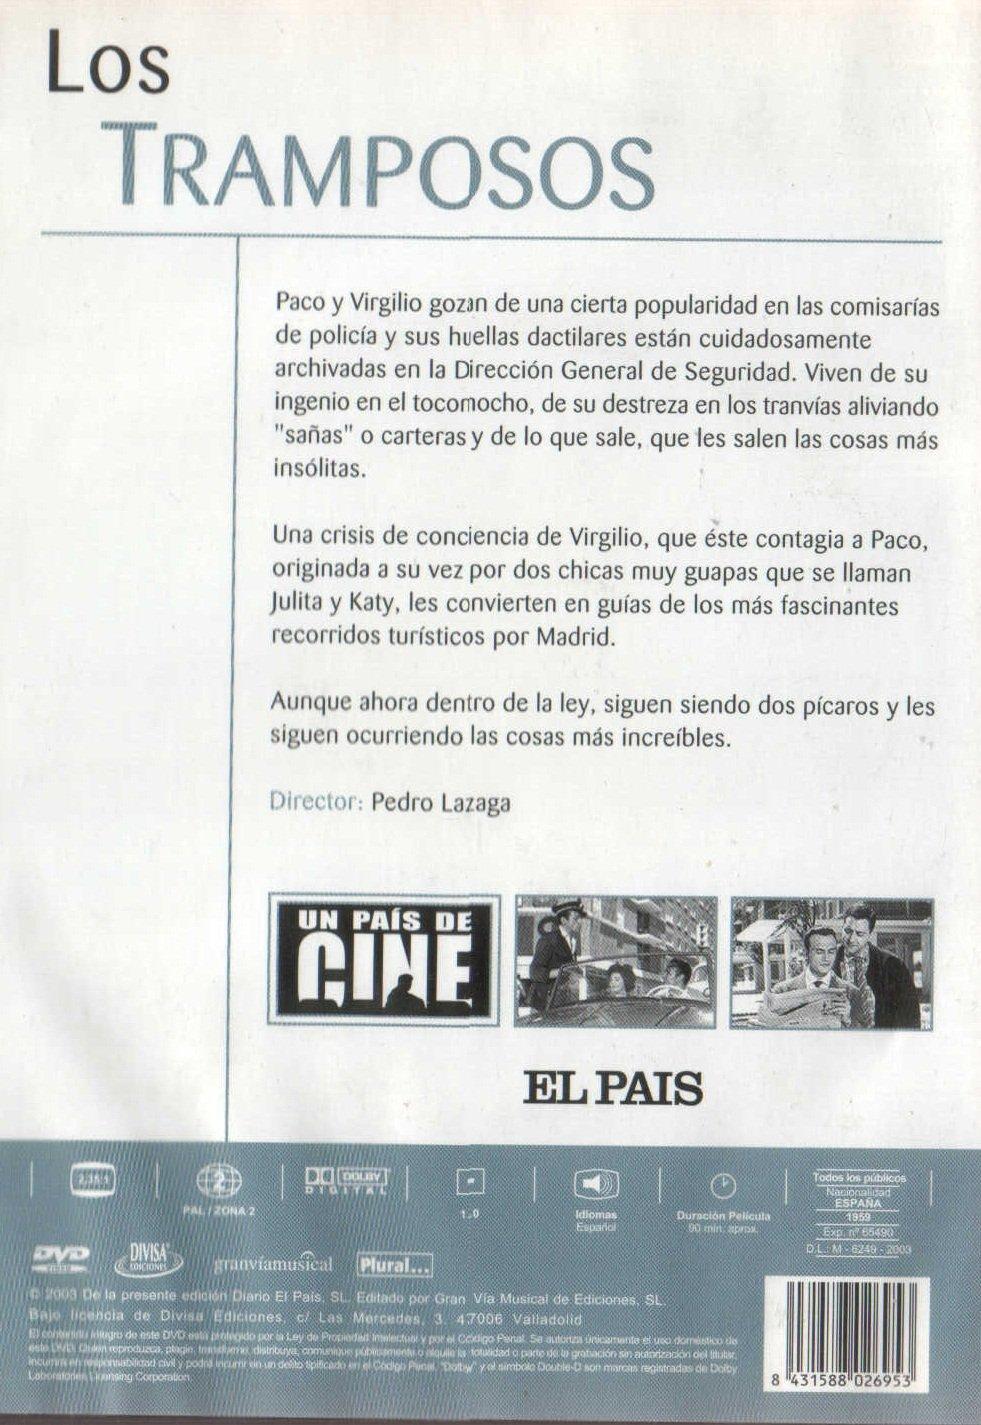 Amazon.com: Los Tramposos (Non Us Format) (Region 2) (Import): Pedro Lazaga: Movies & TV